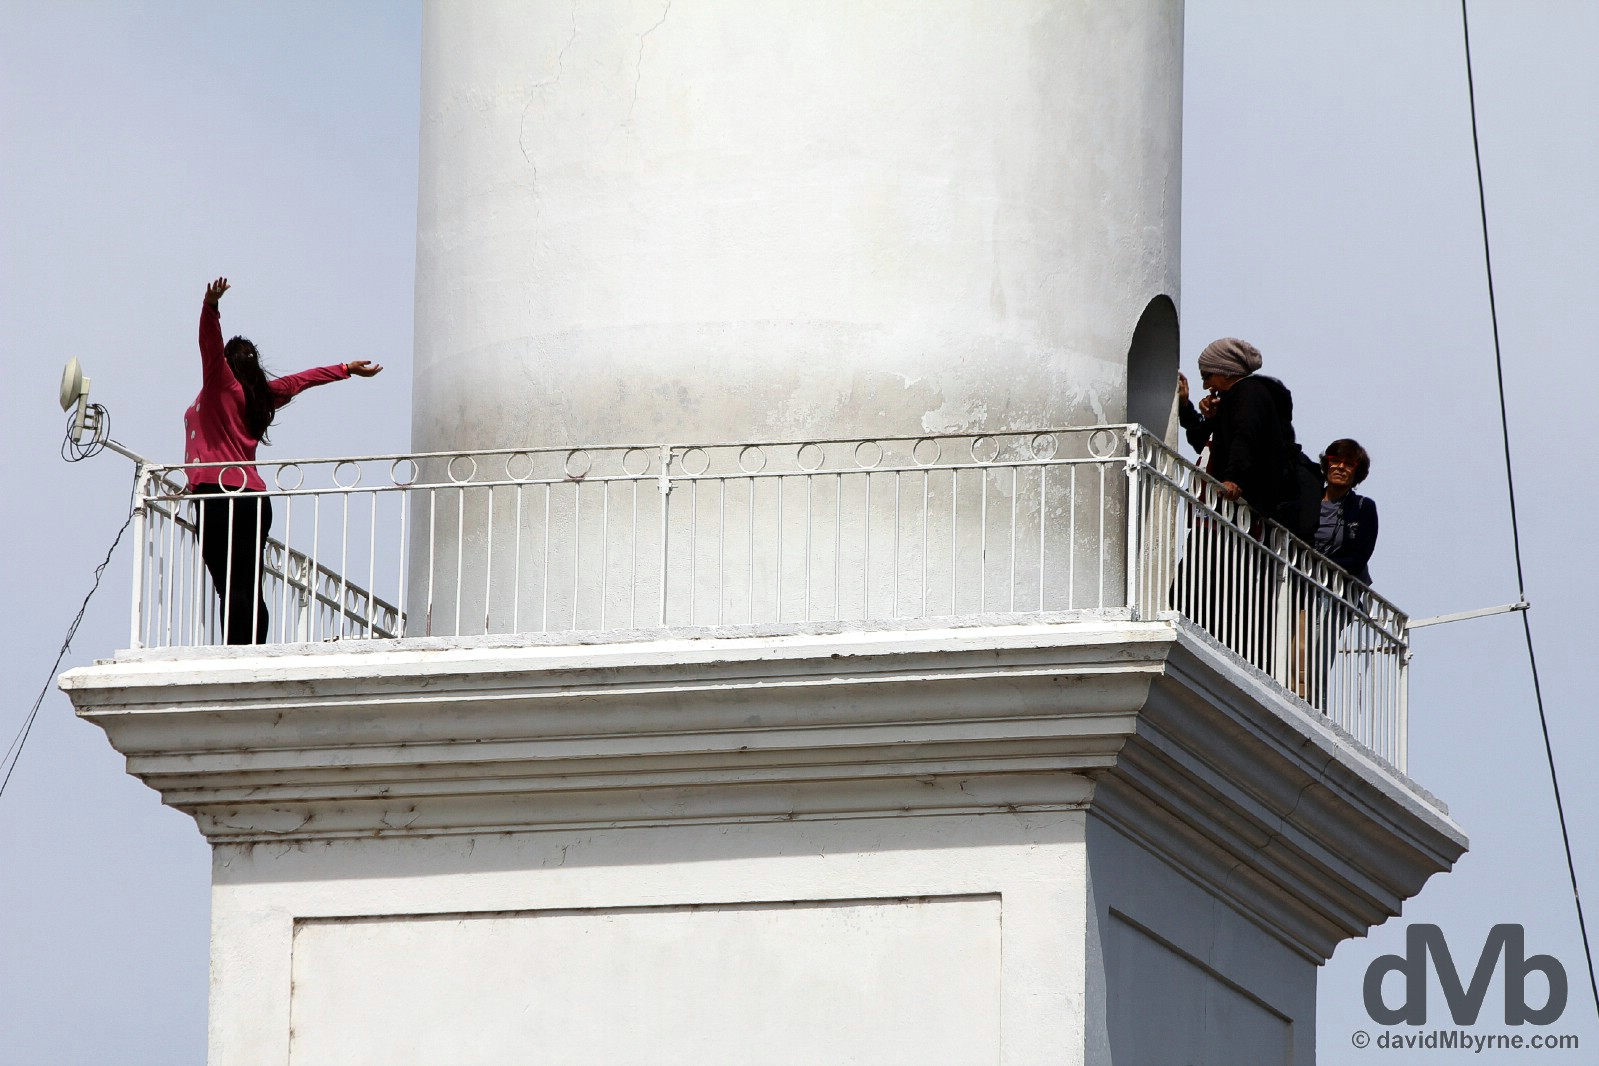 Colonia del Sacramento Lighthouse, Colonia del Sacramento, Uruguay. September 20, 2015.